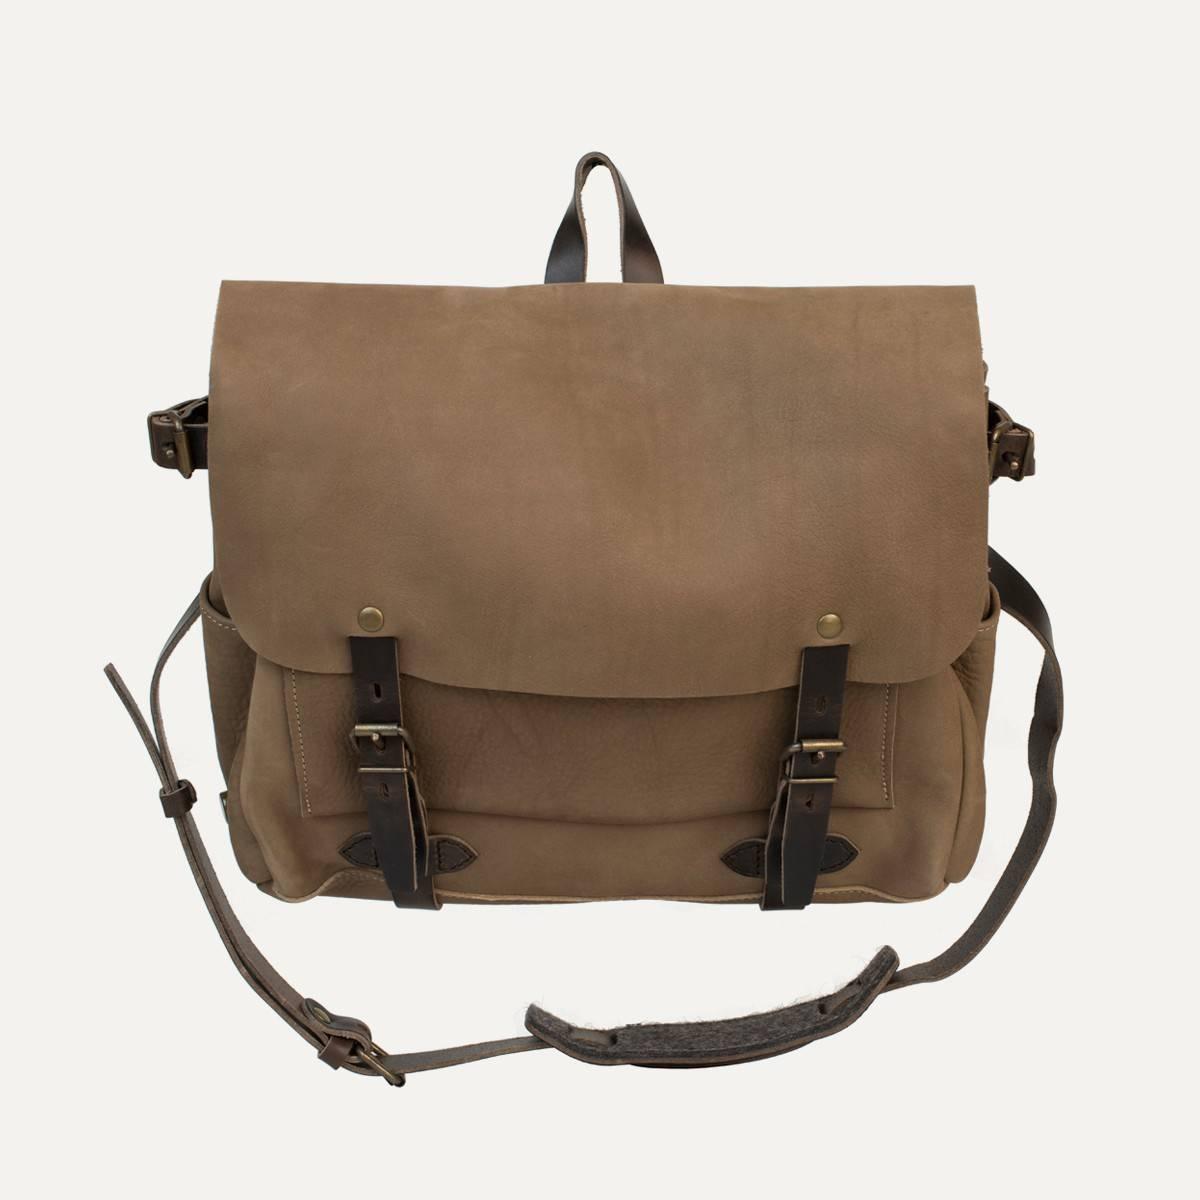 Postman bag Eclair - Taupe (image n°1)